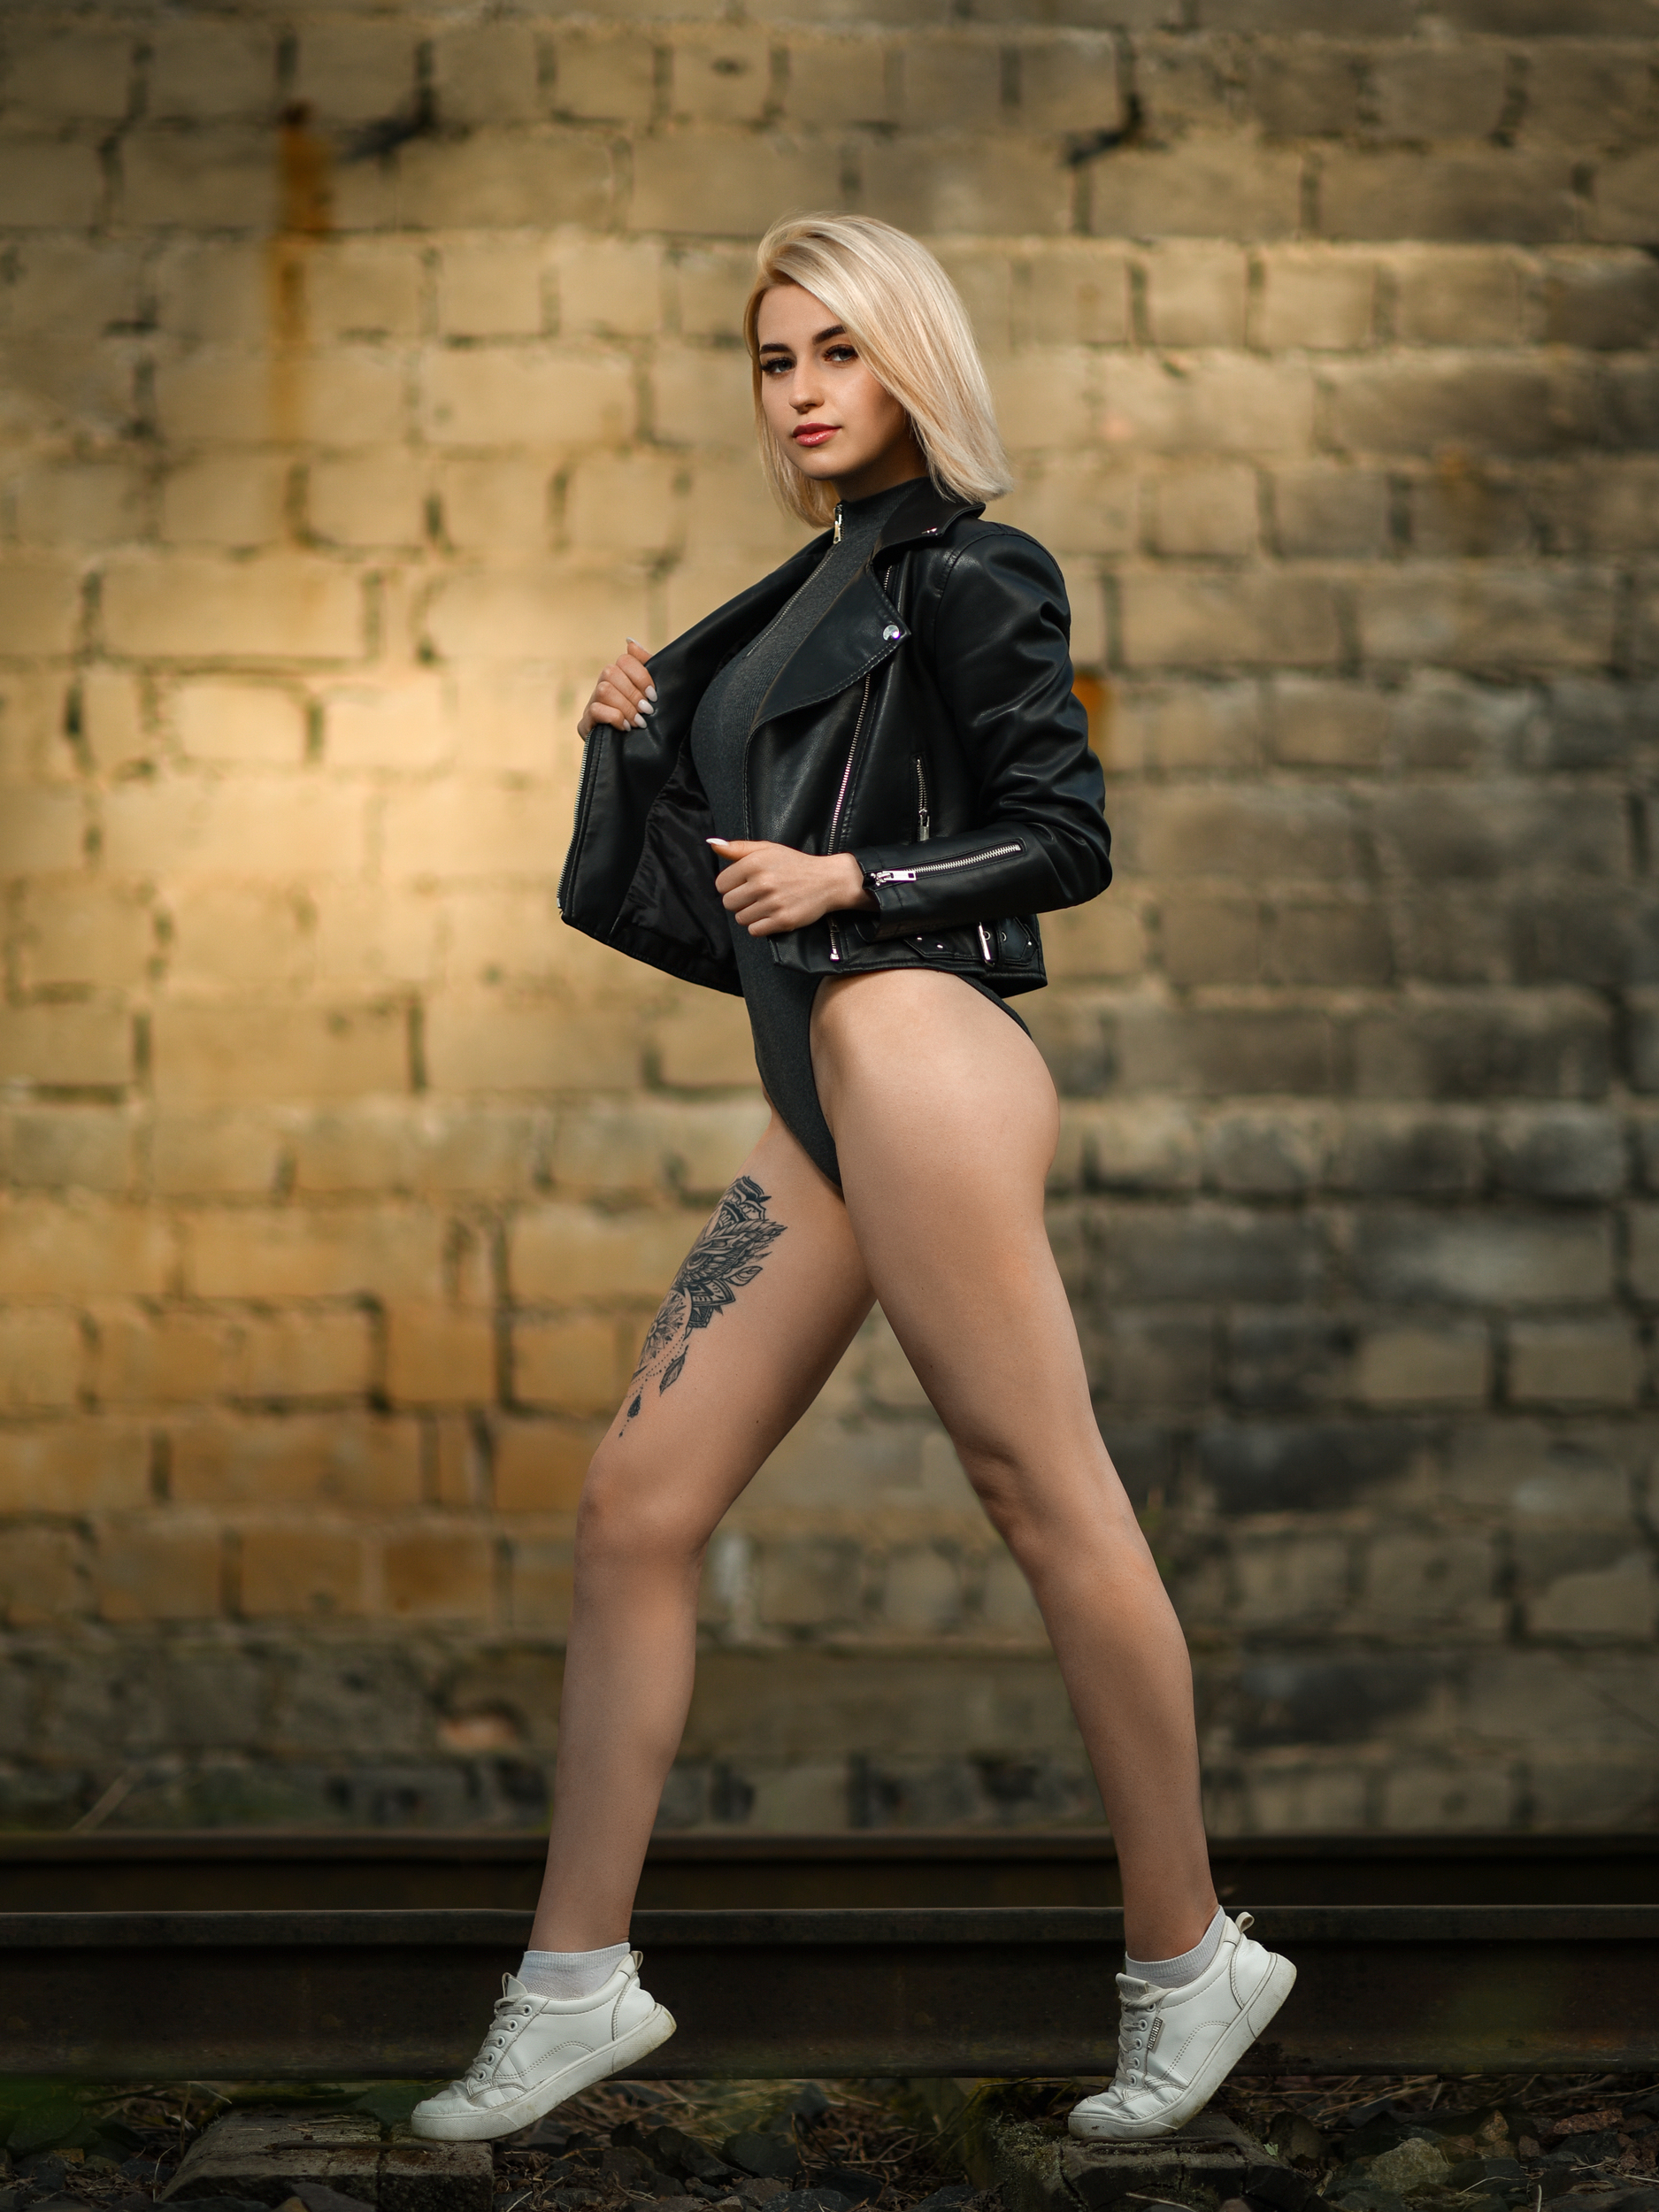 nu portrait girl topless dmitrymedved, Медведь Дмитрий